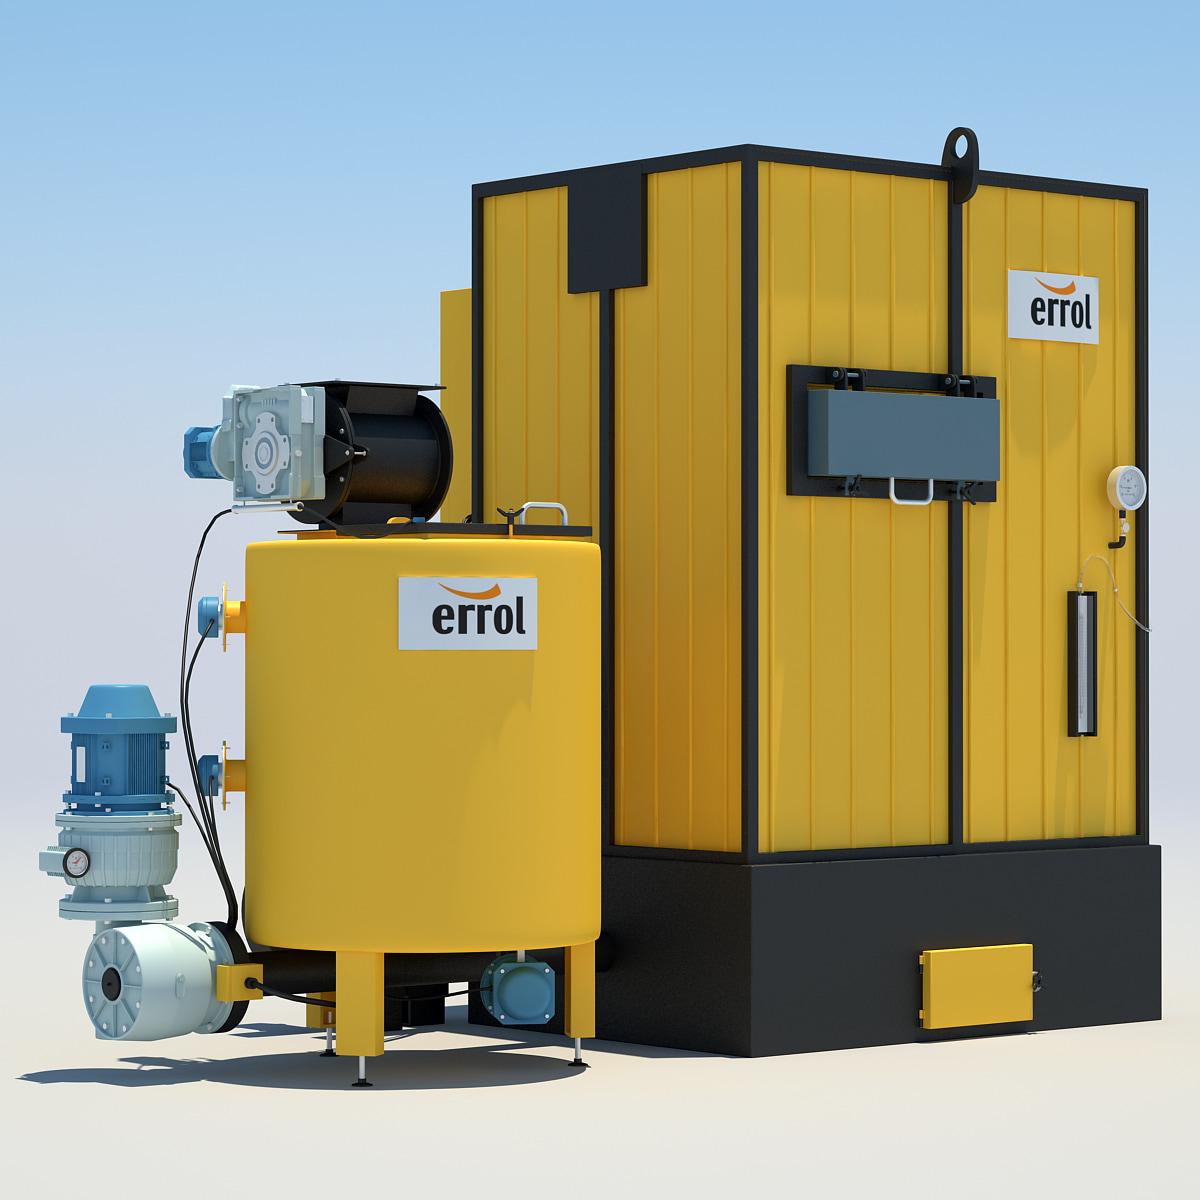 Industrial_Water_Heating_System_V3_001.jpg